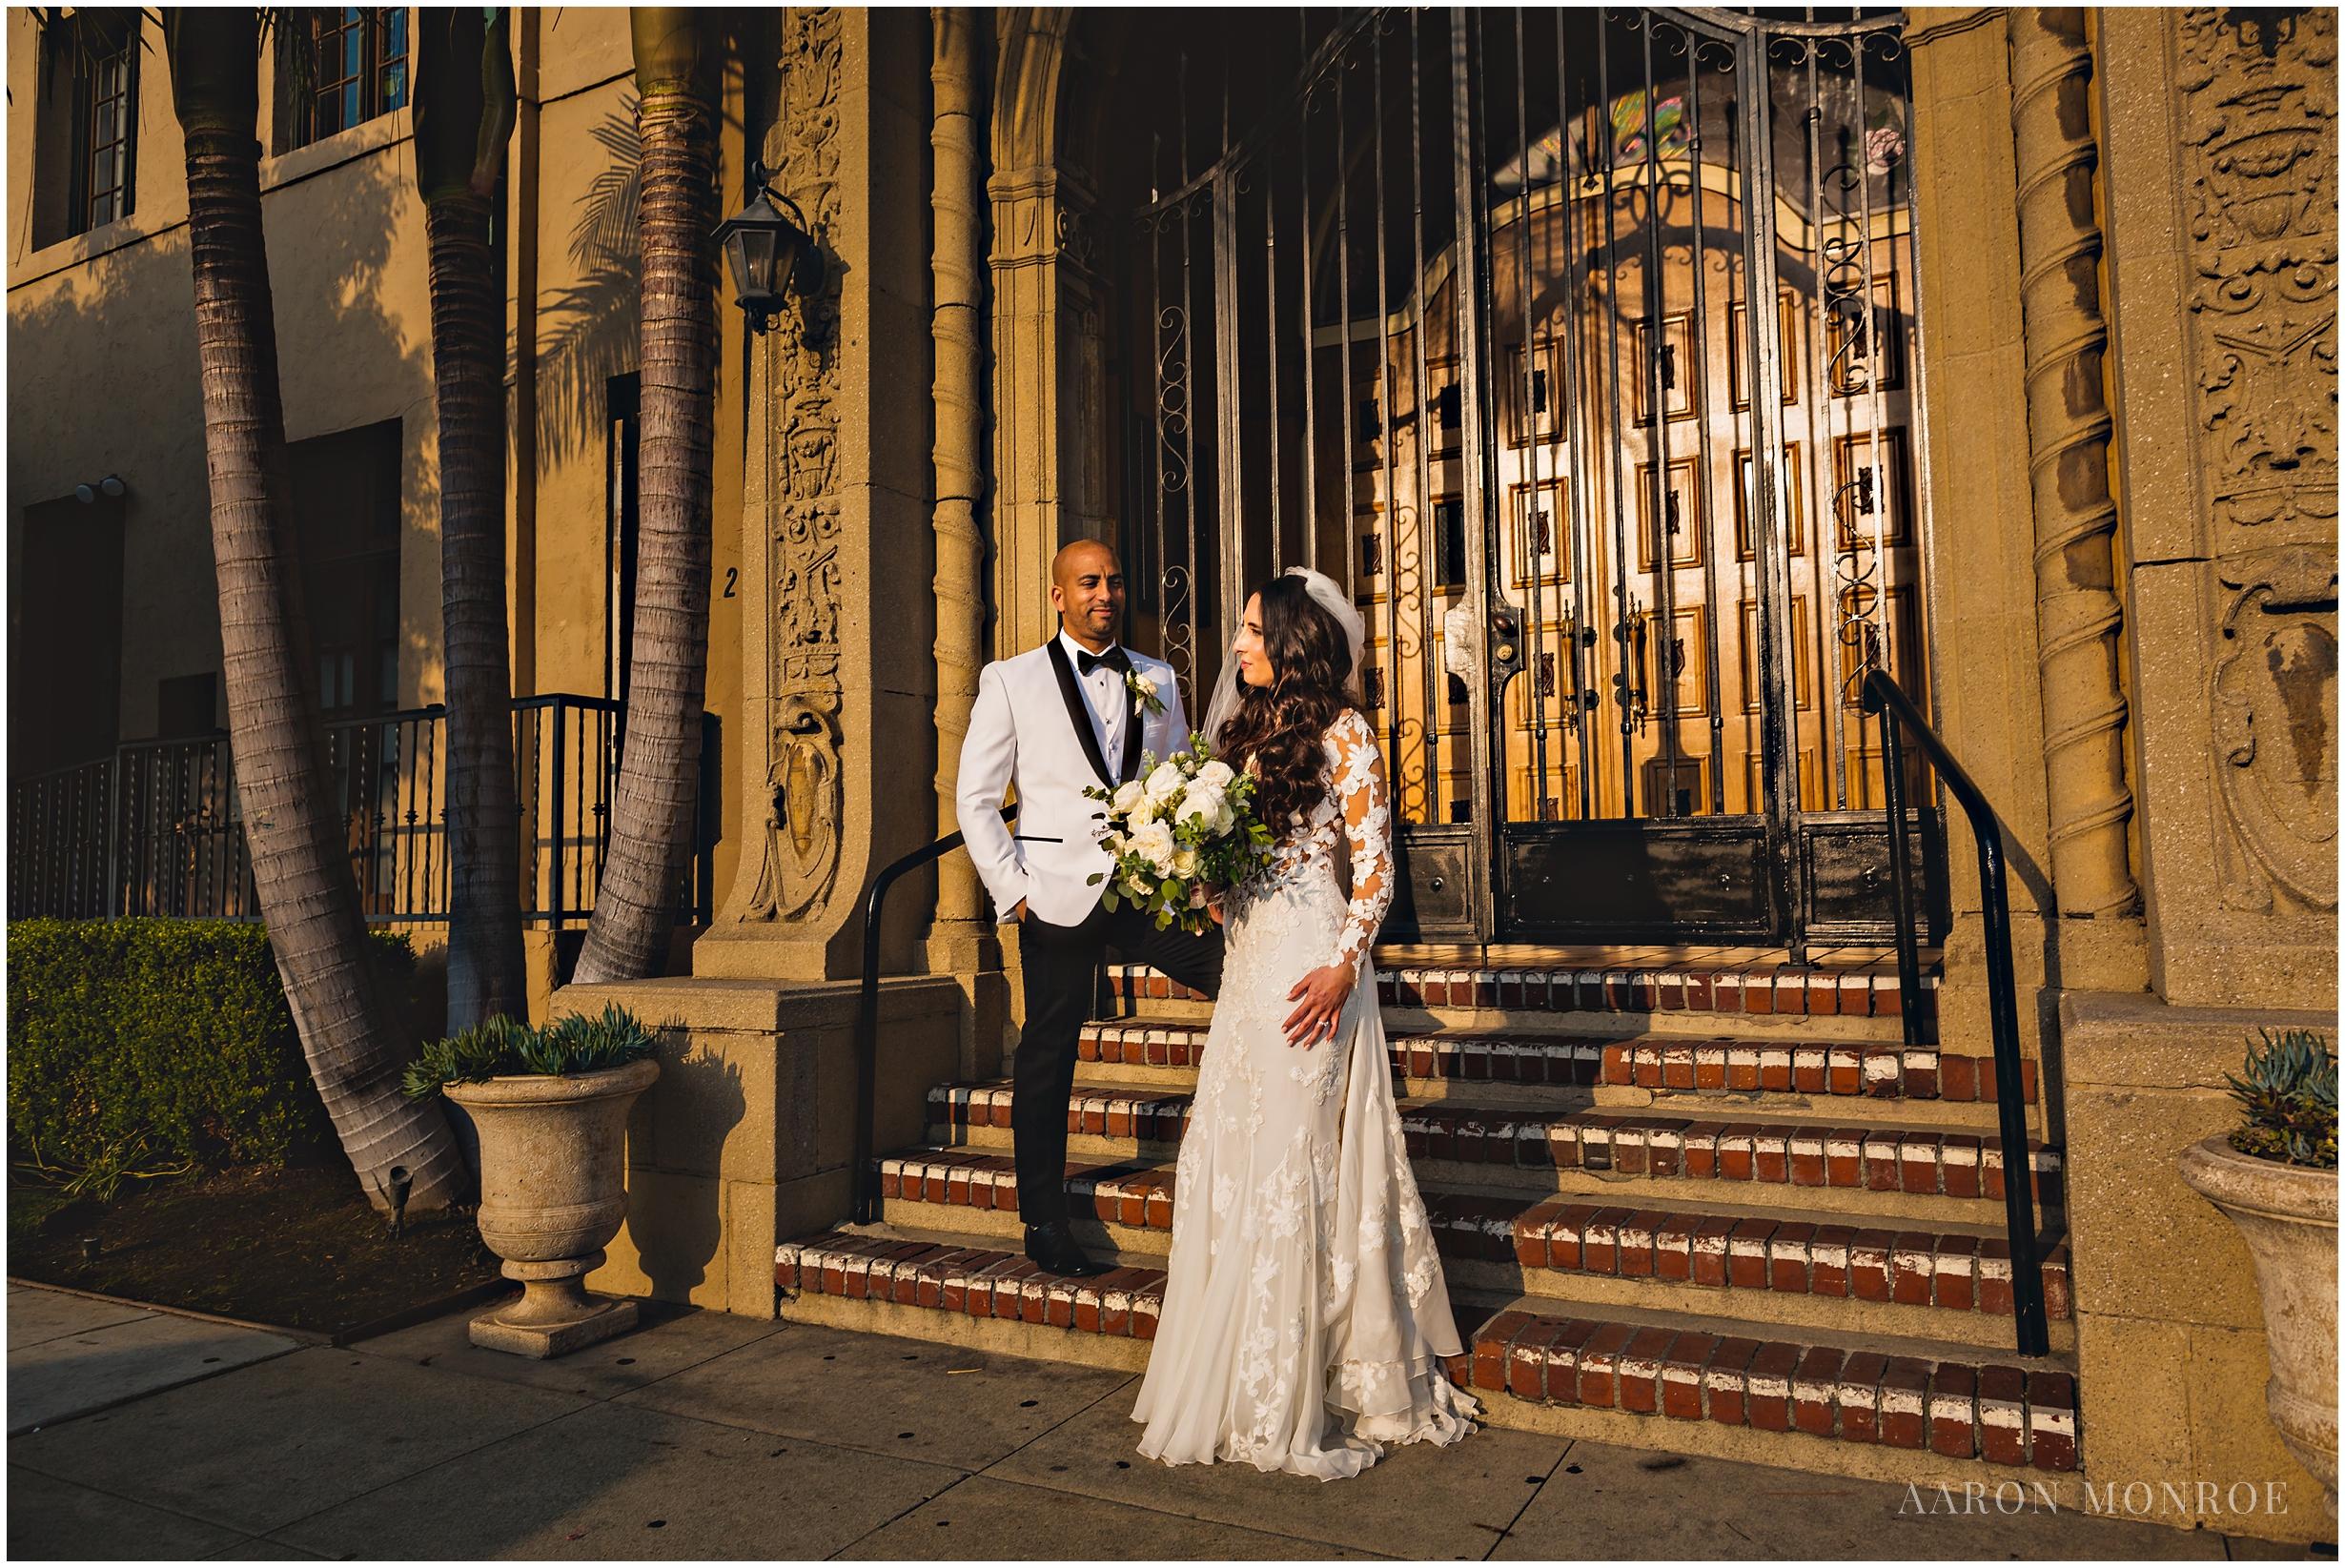 Ebell_Long_Beach_Wedding_Photography_0852.jpg